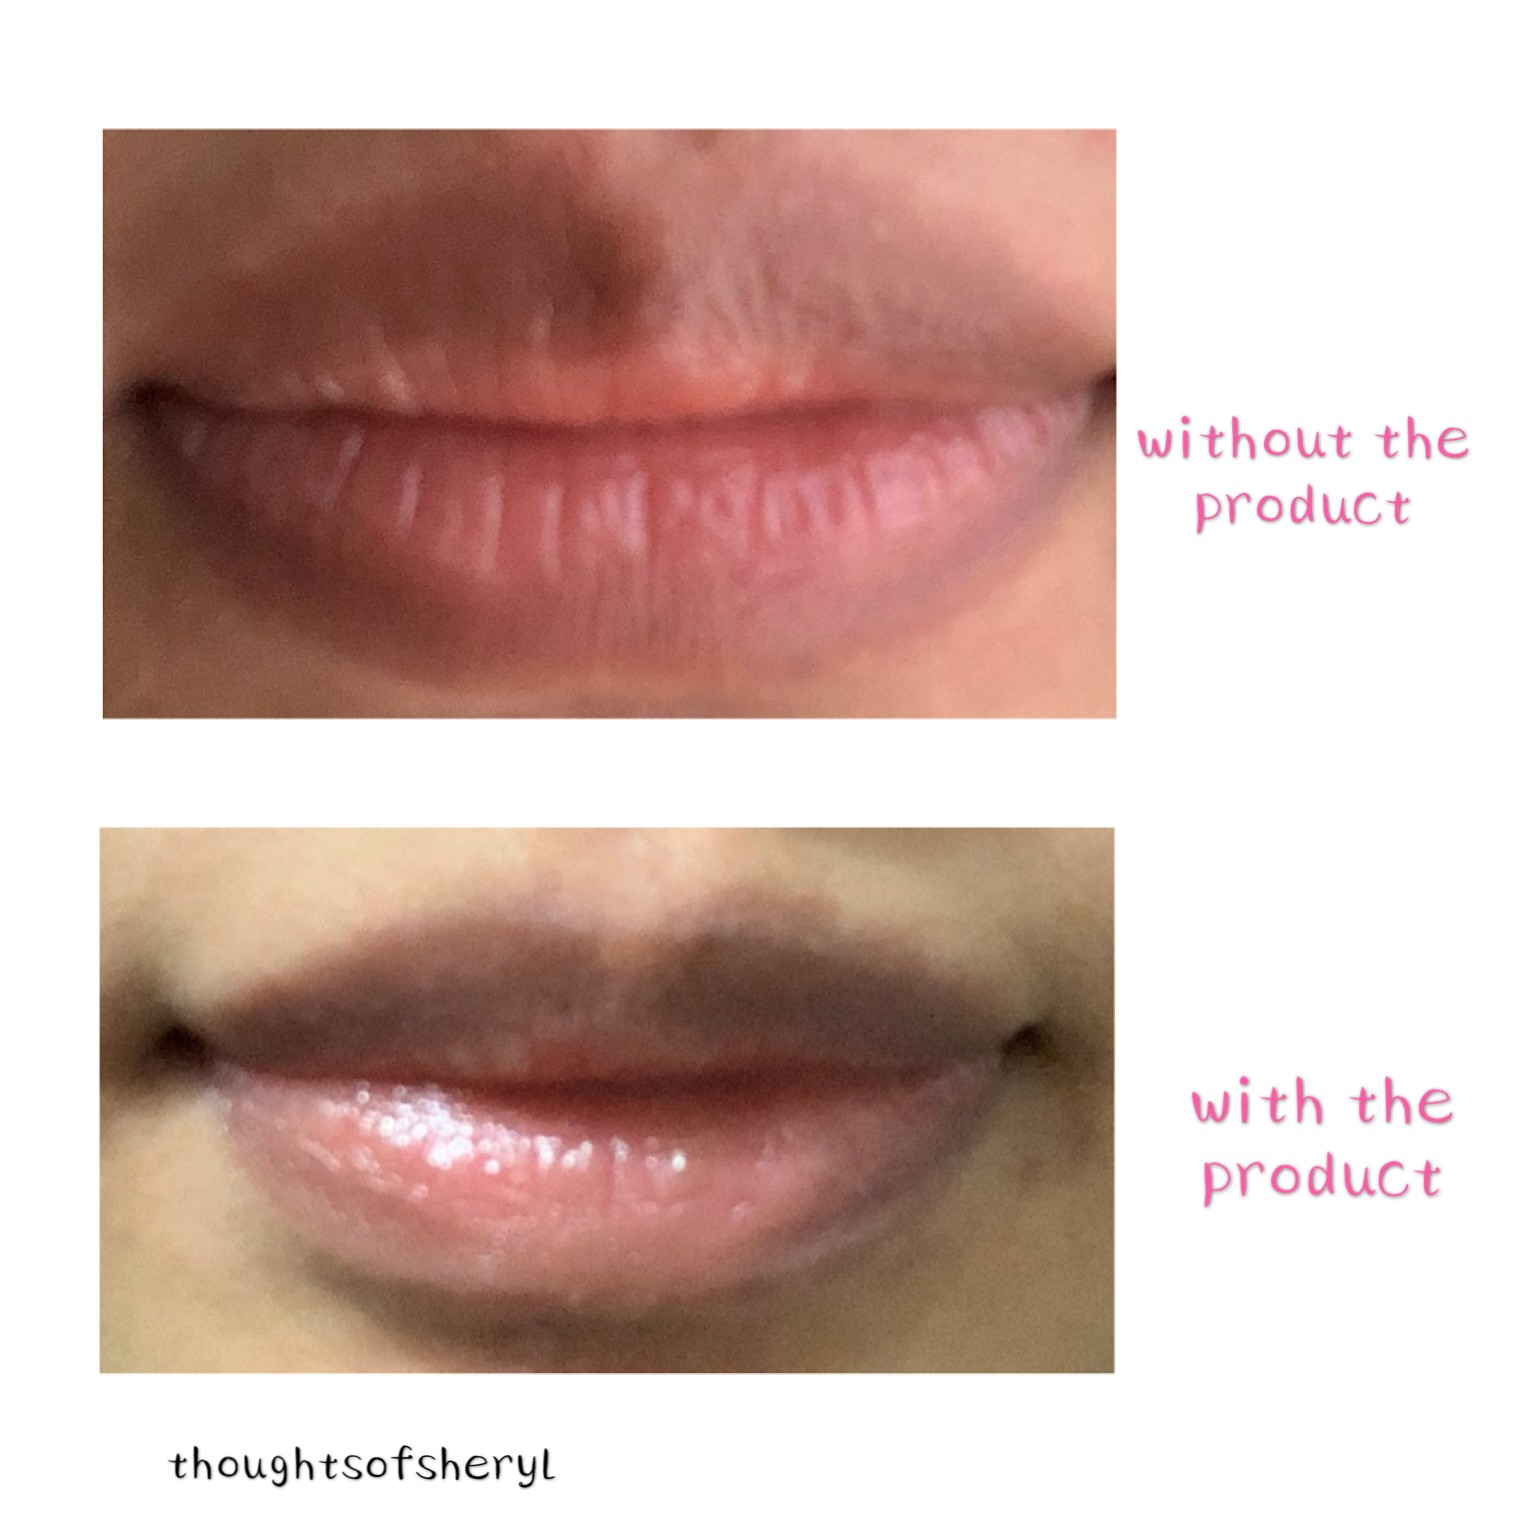 flowflushi lip treatment effect